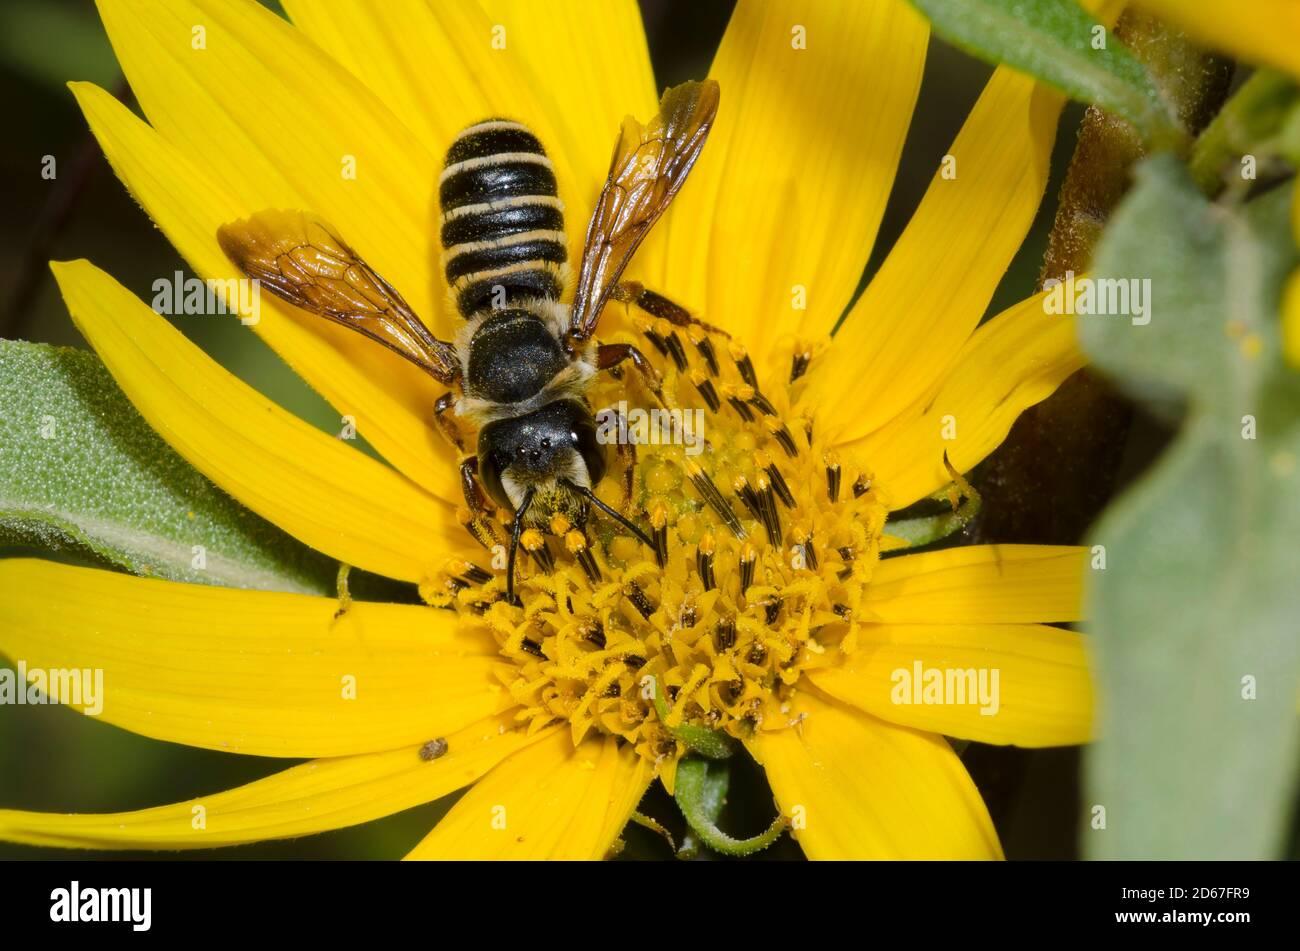 Say's Leaf-cutter Bee, Megachile inimica sayi, forrajeando en el girasol Maximiliano, Helianthus maximiliani Foto de stock